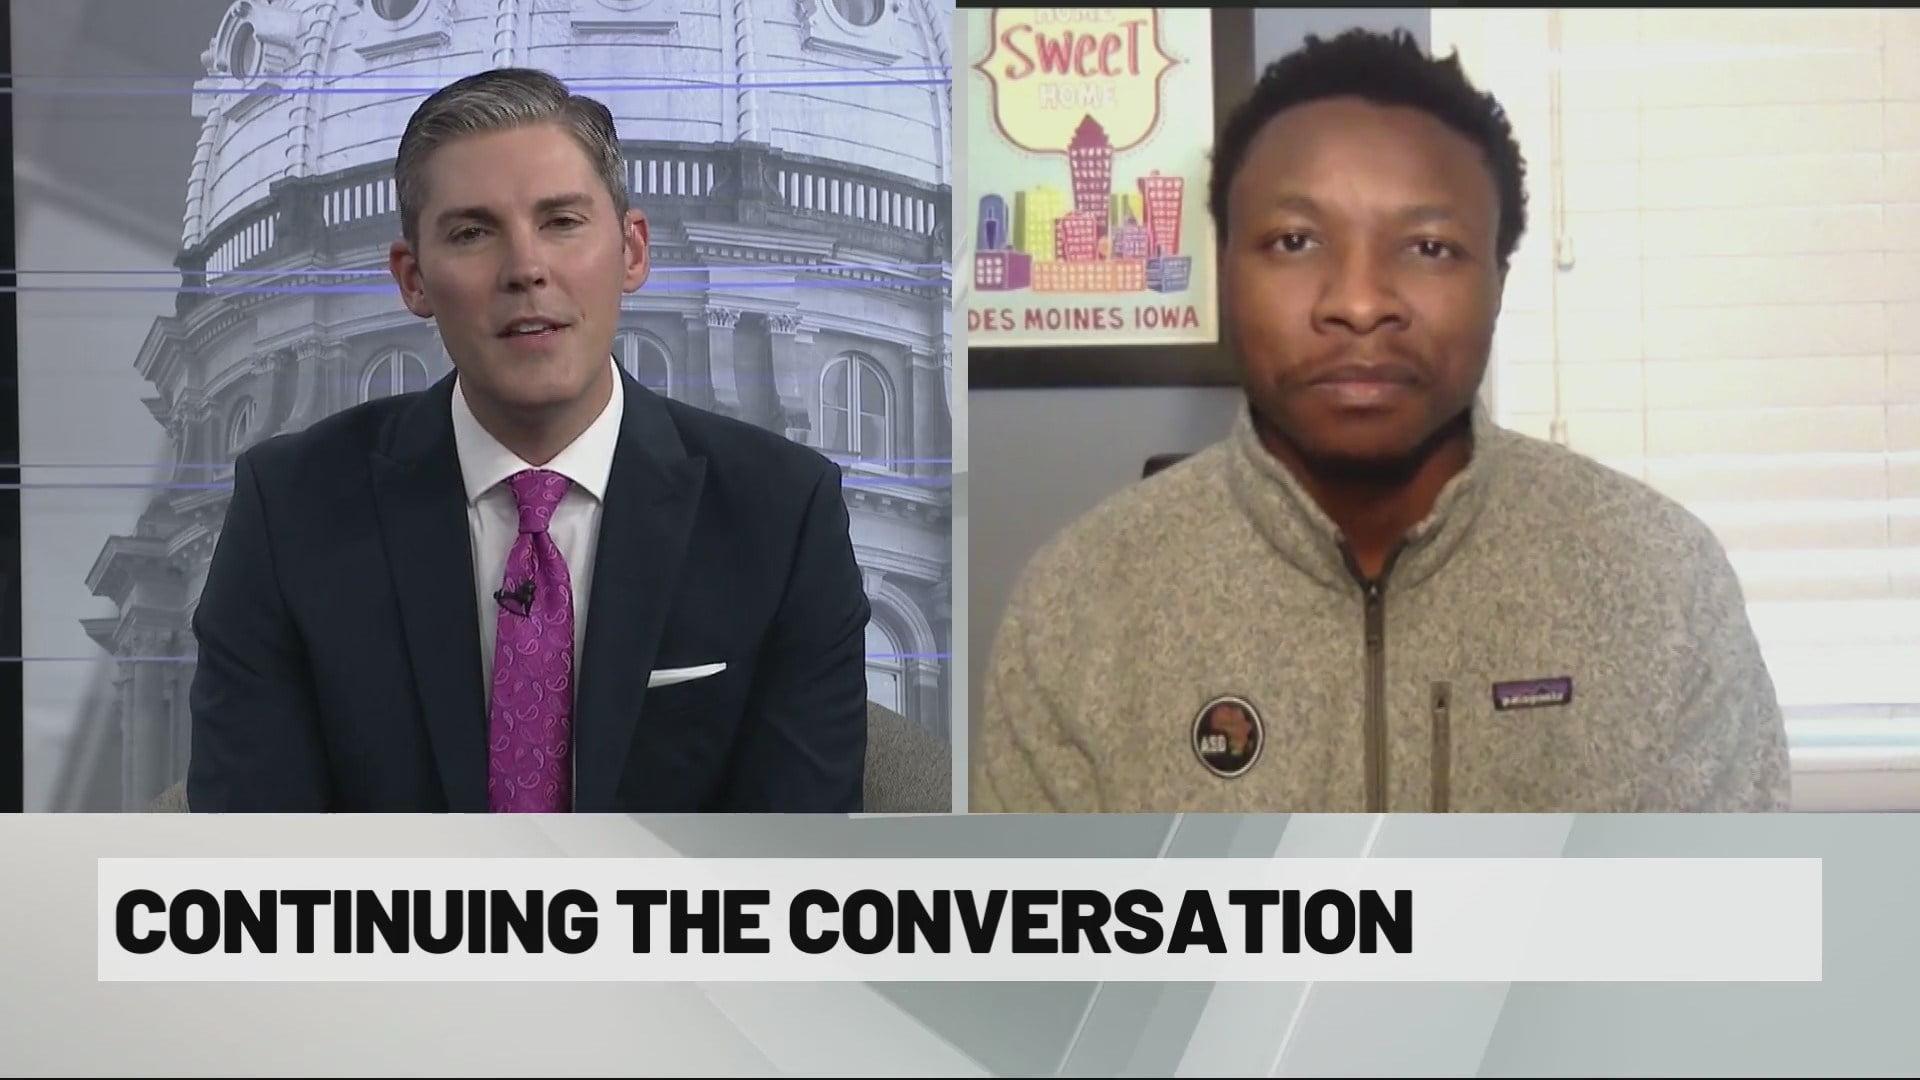 'Token Black Kid': What Systemic Racism Looks Like 1